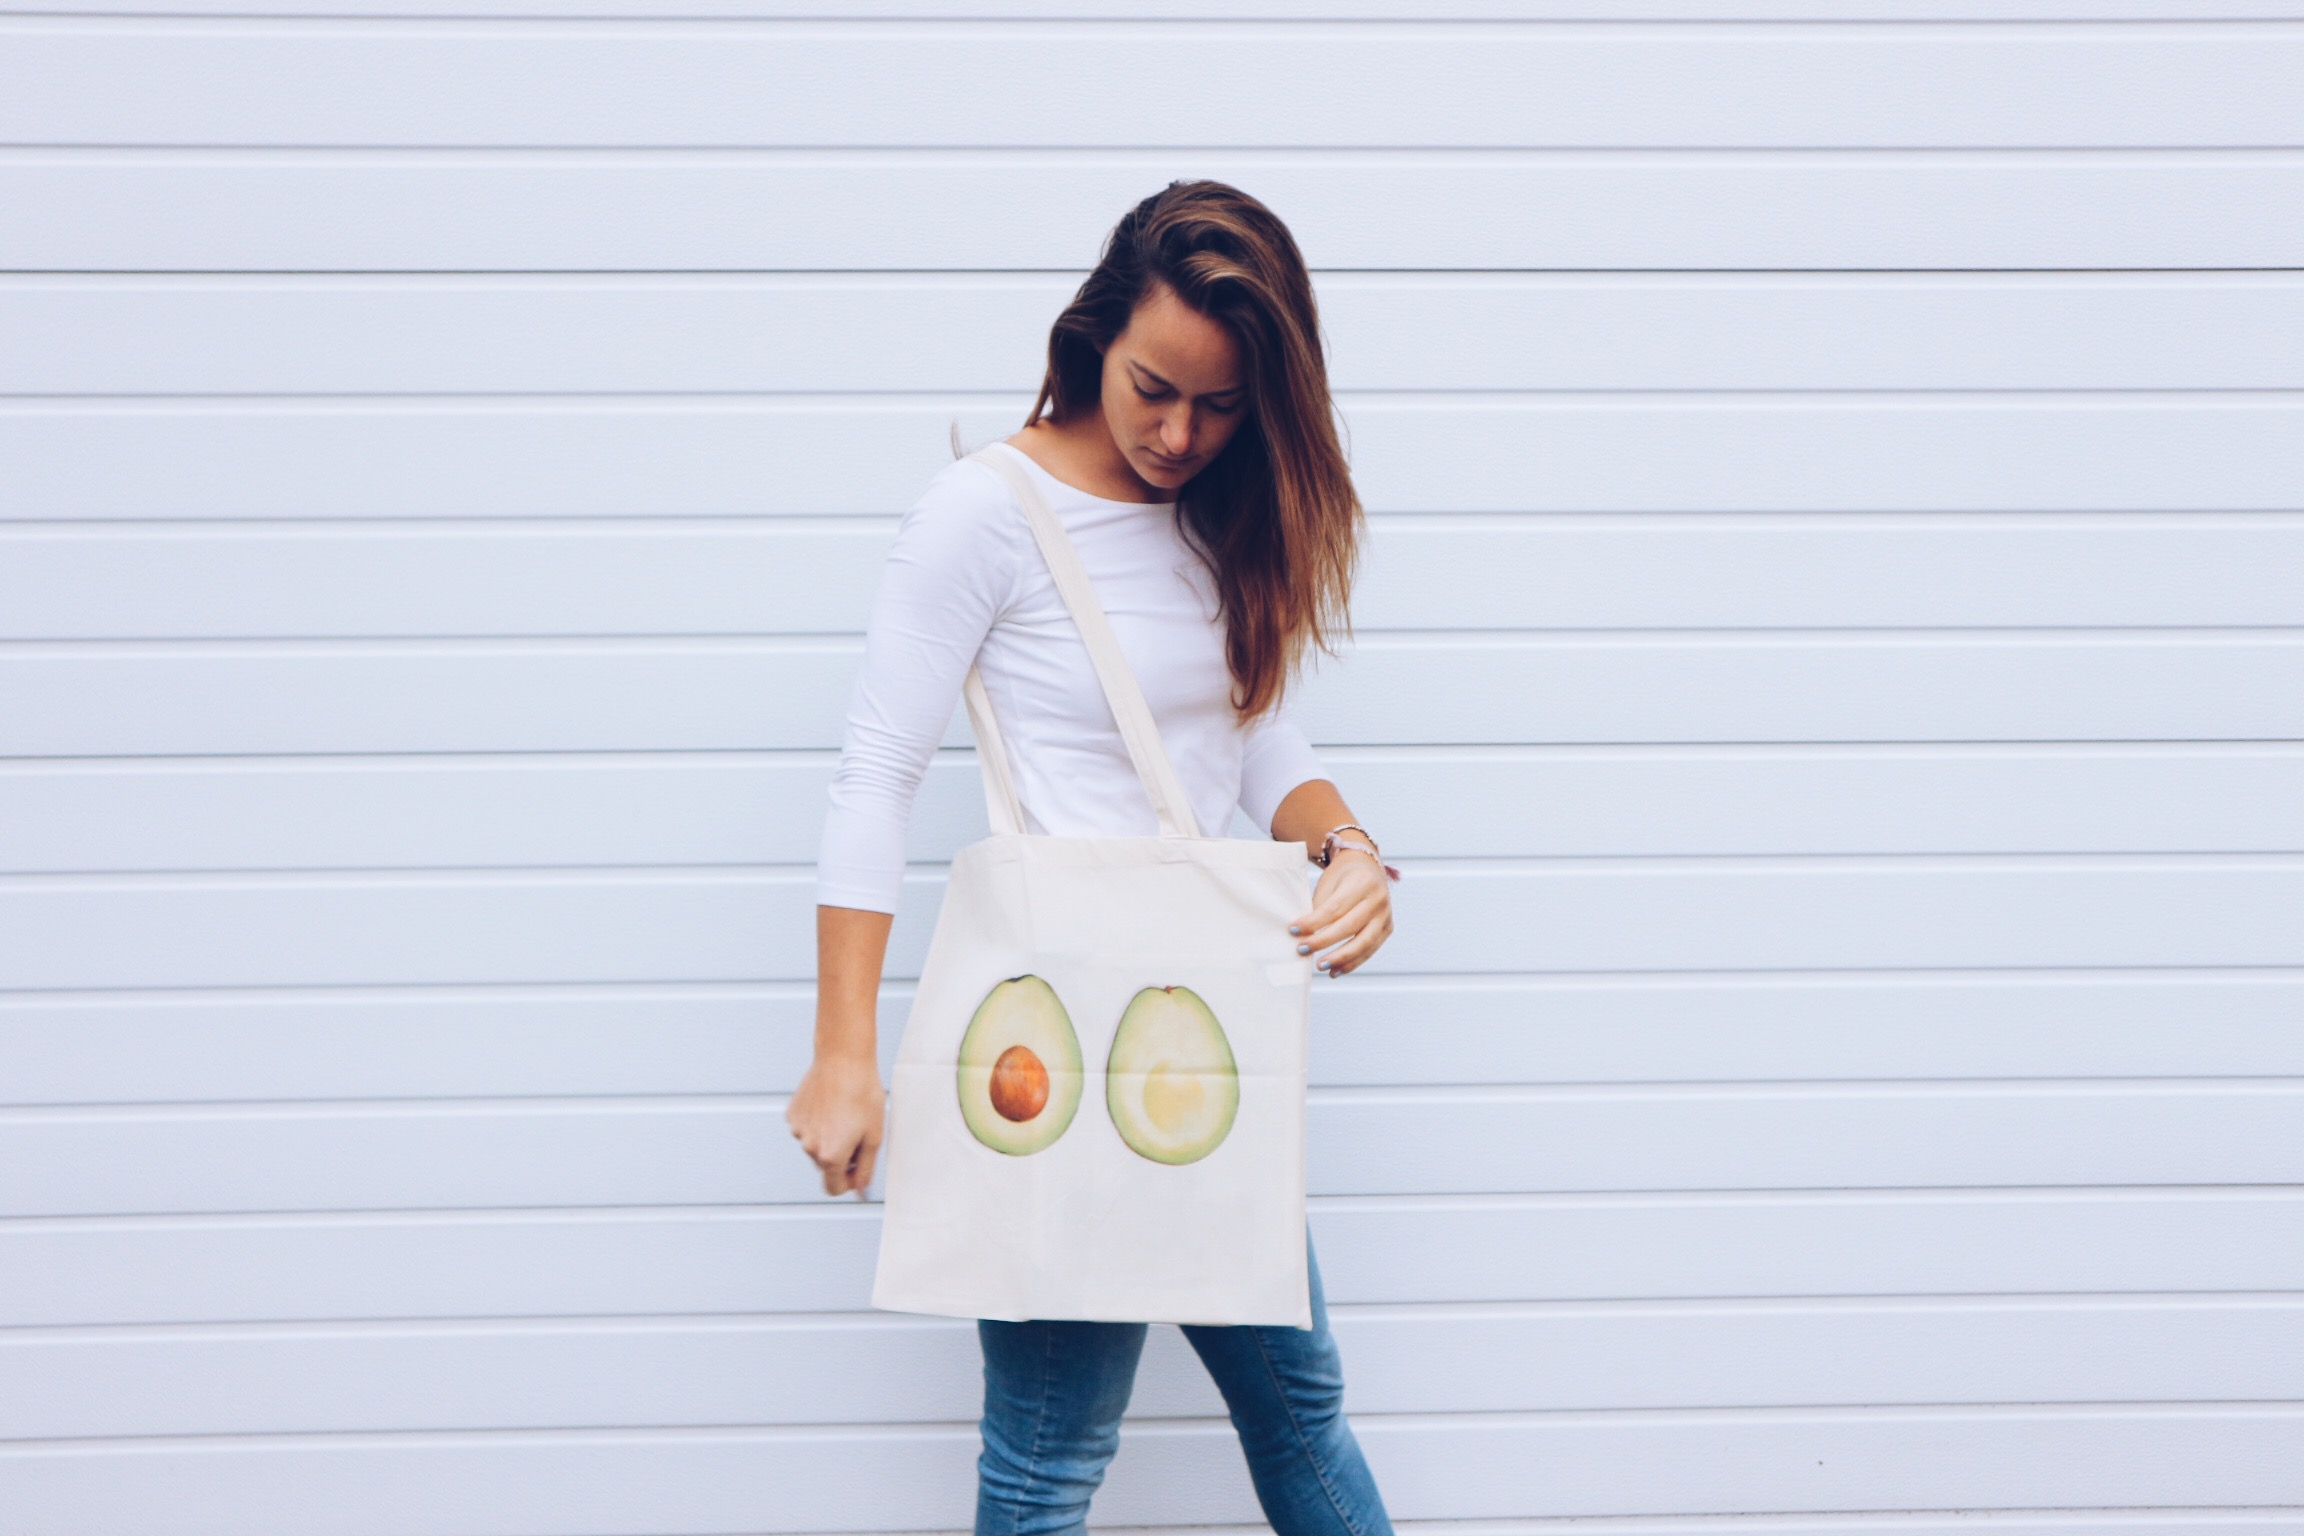 Bag, tas, canvas, baggingaround, outfit, wiw, wiwt, ootd, jeans, look, fashion, fashionista, xmariekie, influencer, girl, meisje, vrolijk, inspiratie